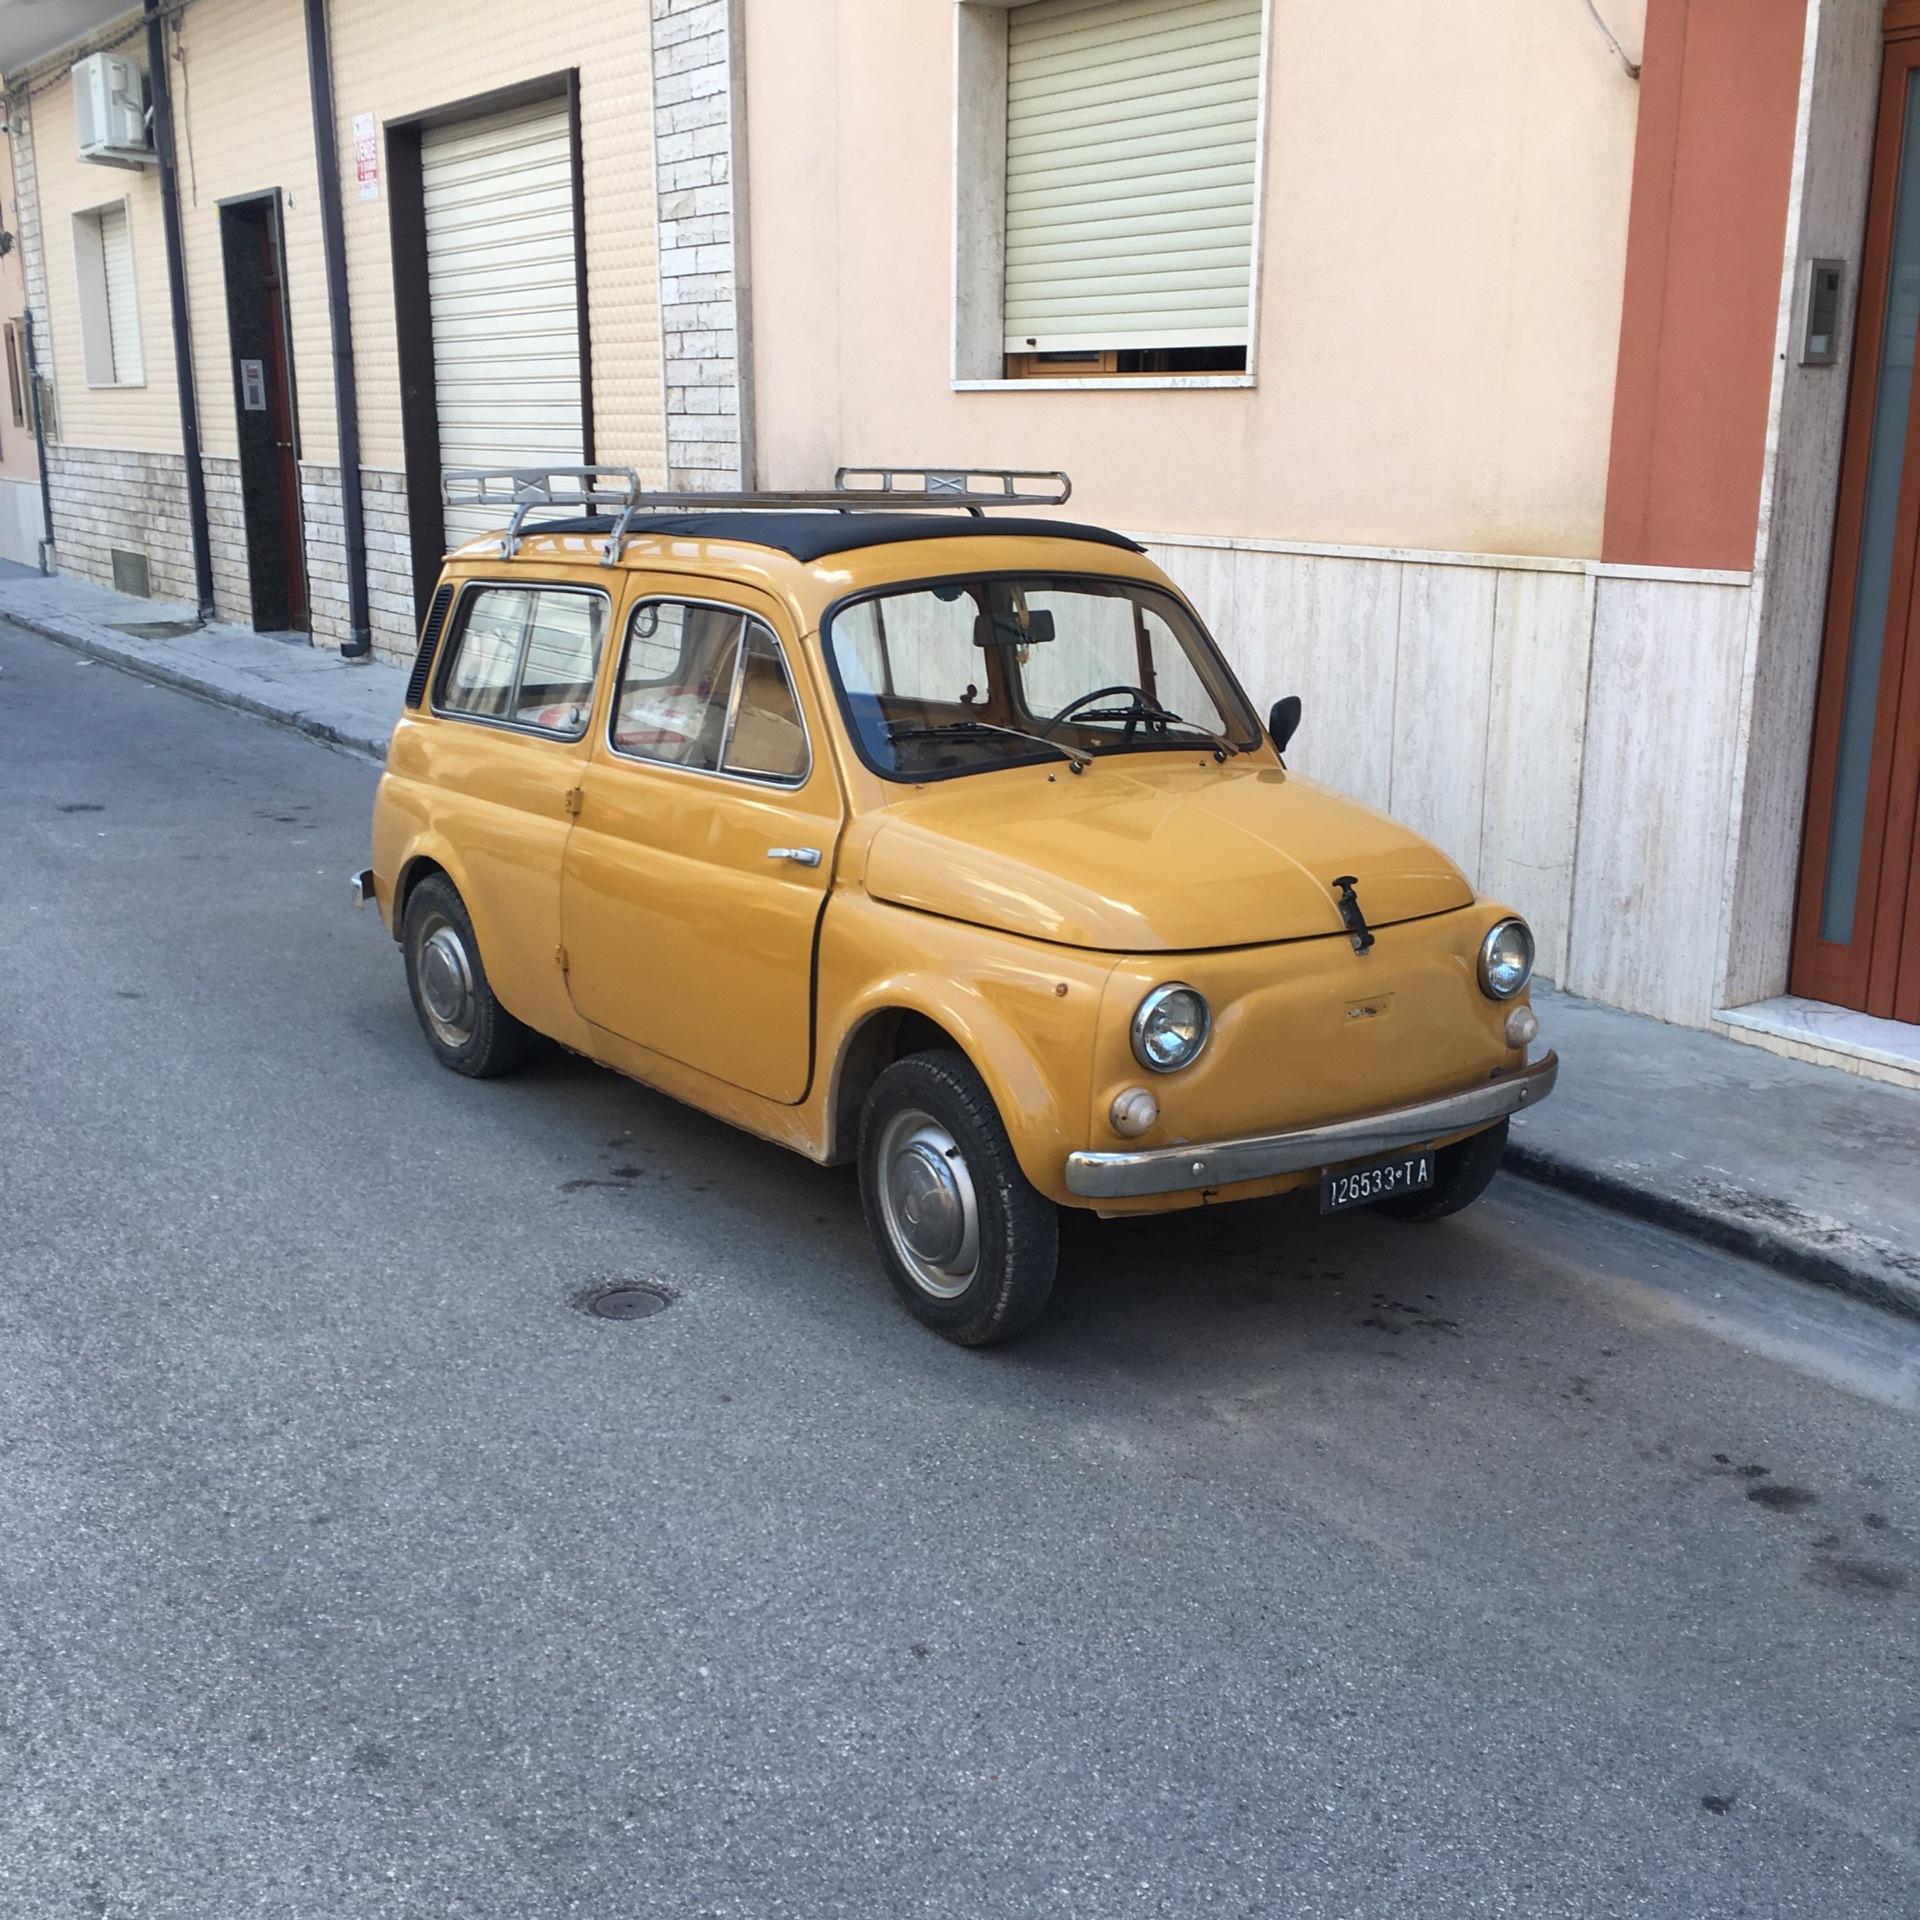 Another Cinquecento Giardiniera, TA being Taranto registration I believe..